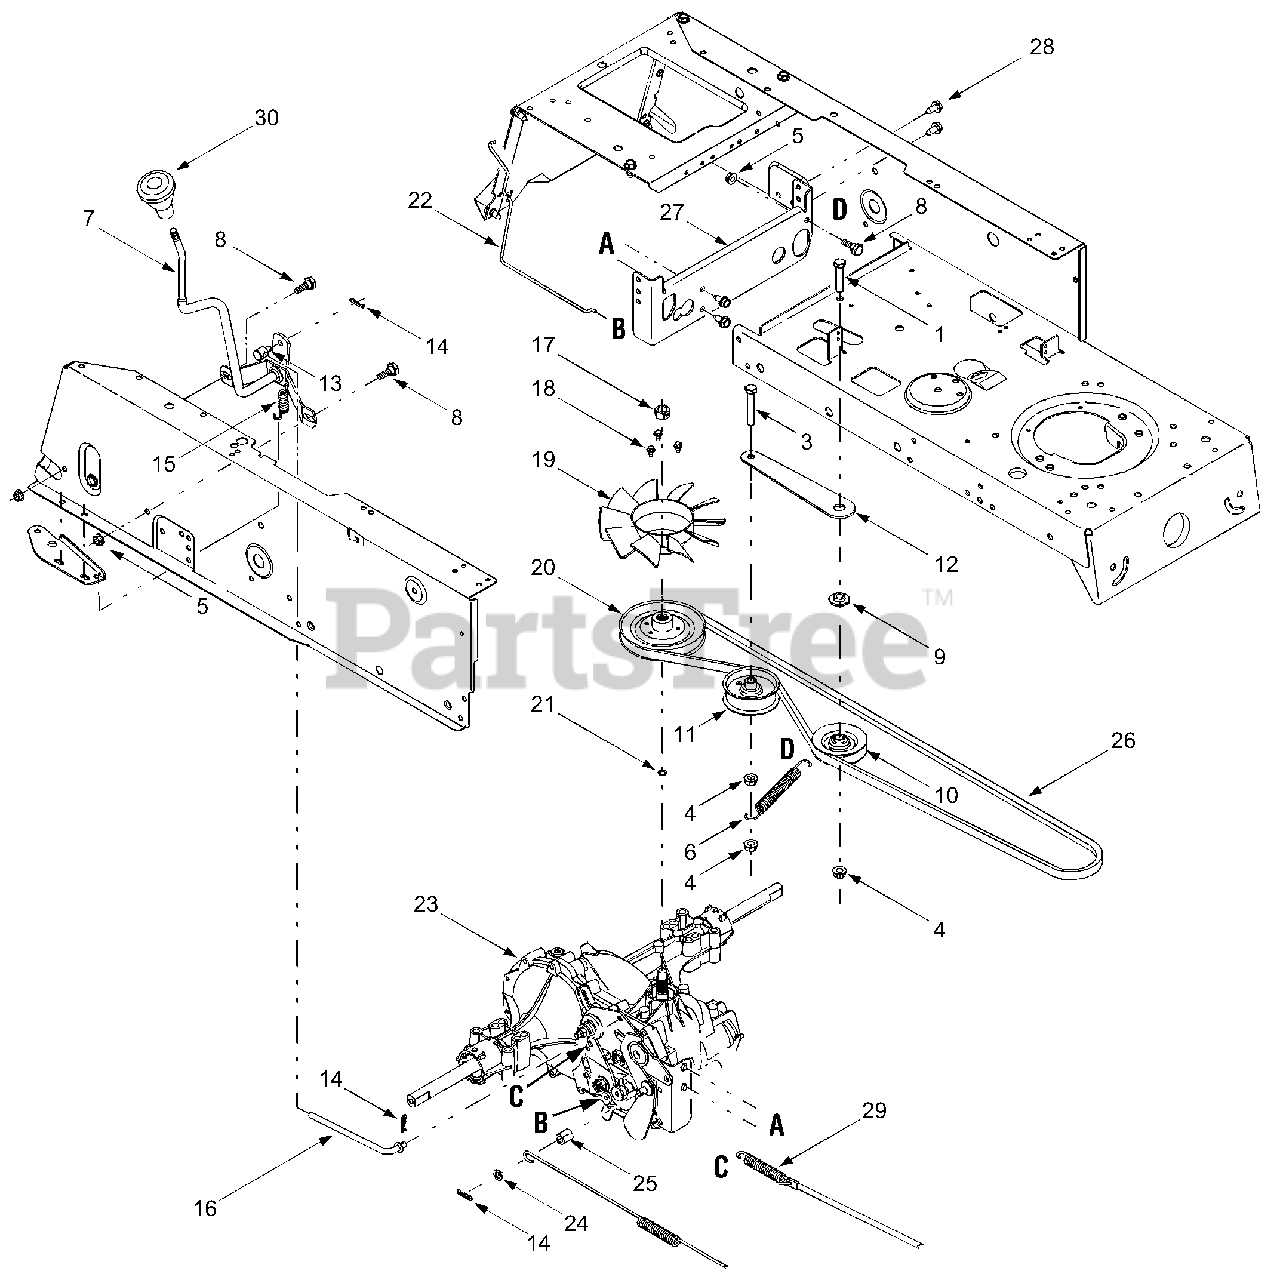 Mtd Yard Machine Wiring Diagram Mtd Circuit Diagrams